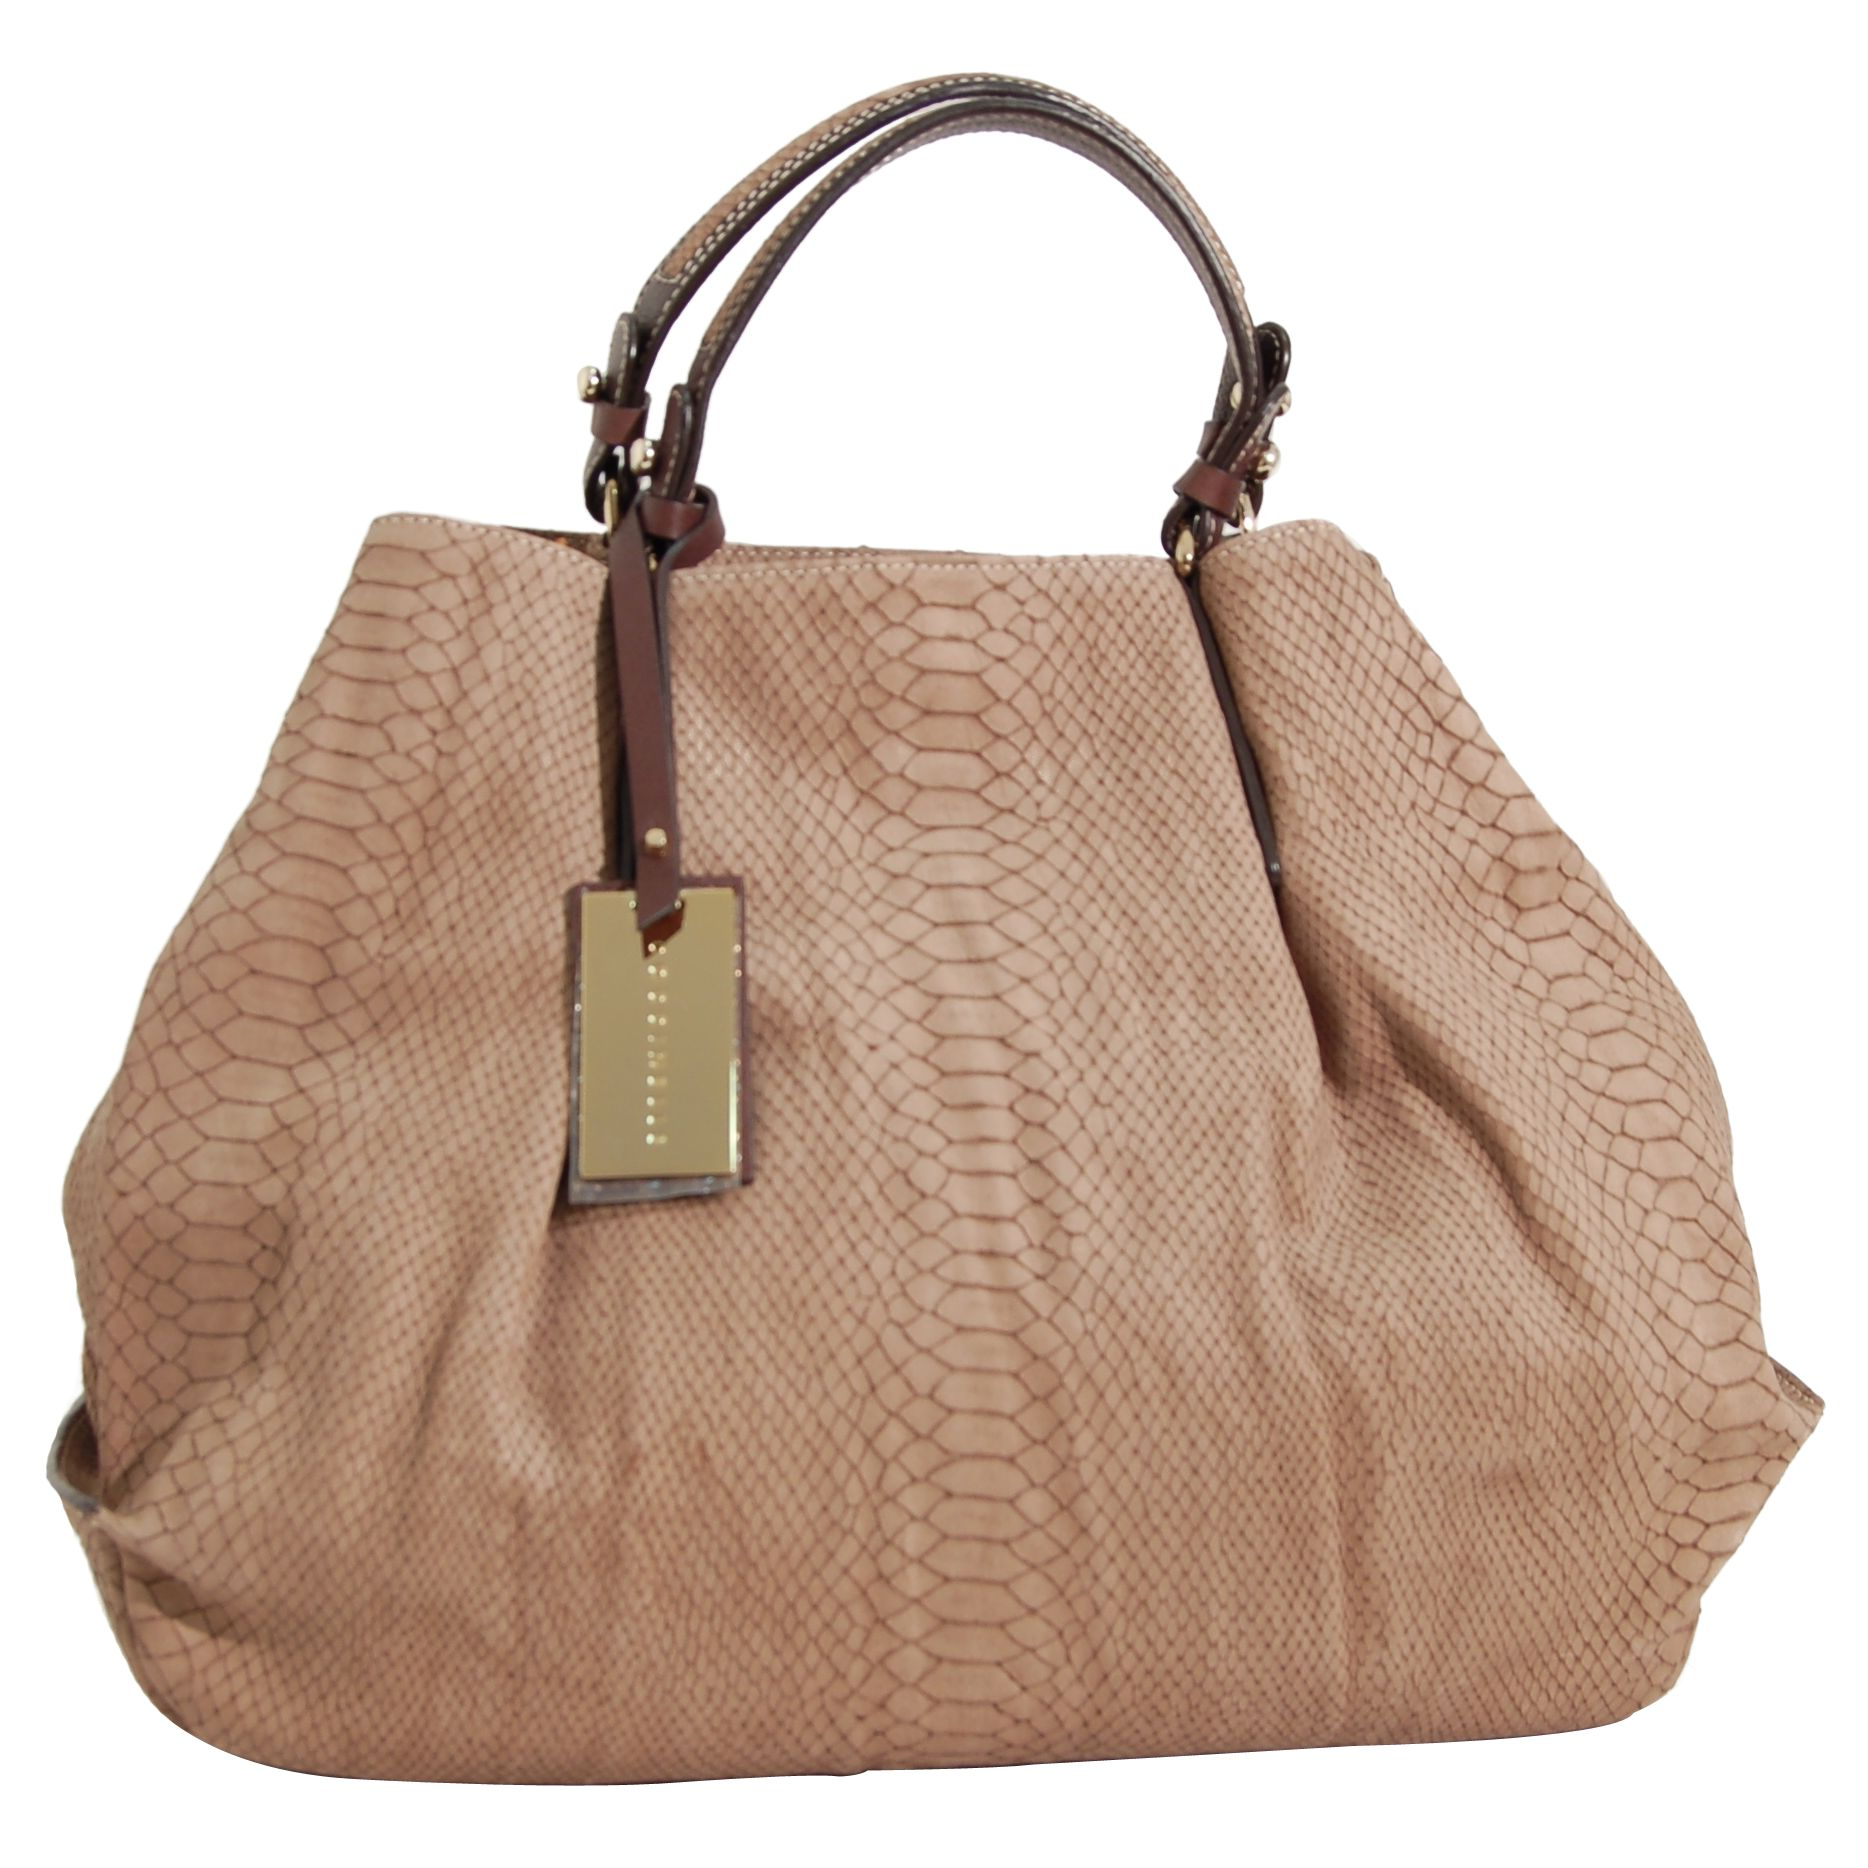 Coccinelle Esma Lux Large Tote Handbag, Beige at John Lewis